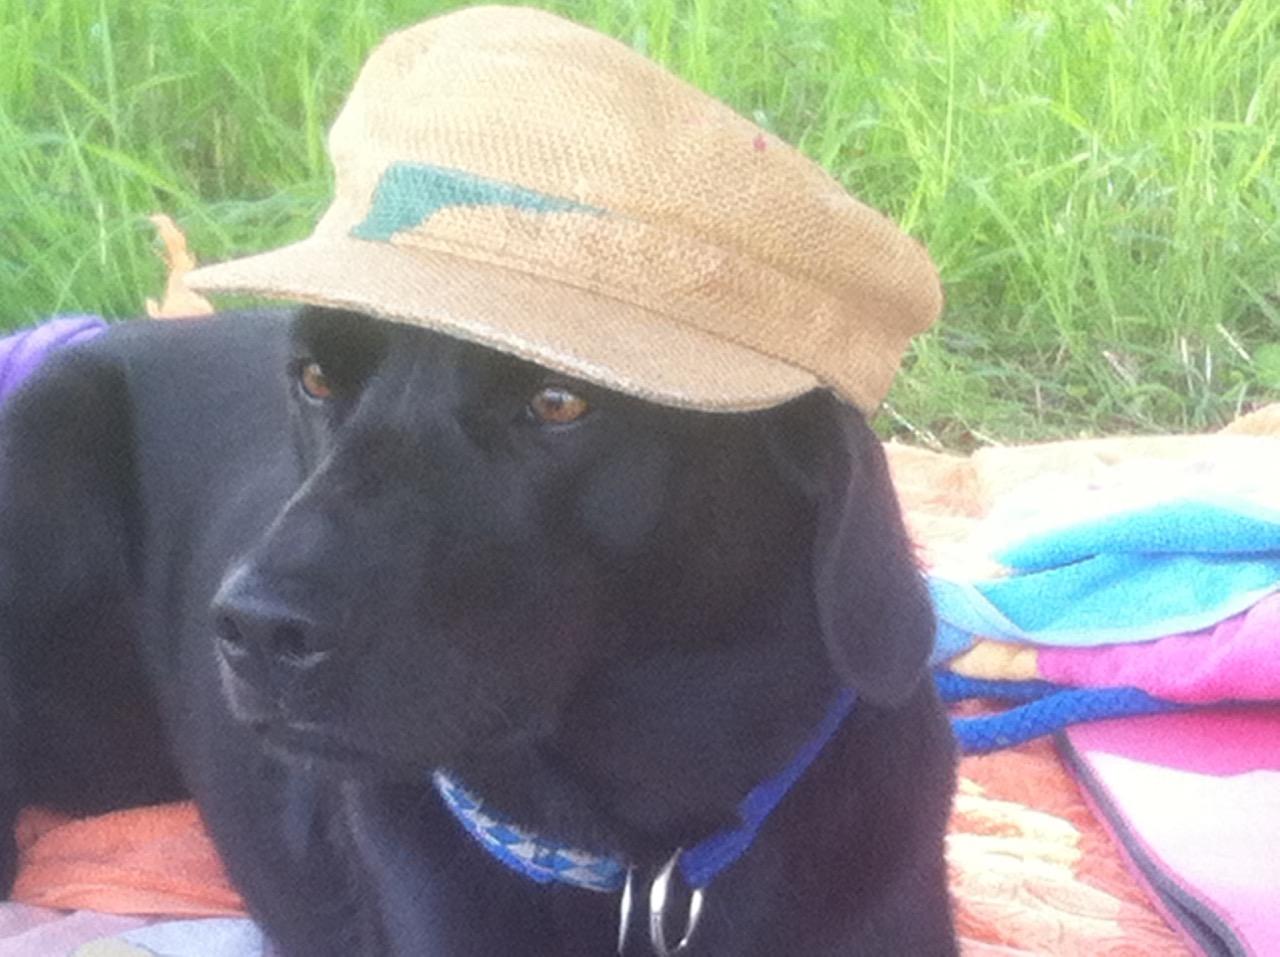 Hund mit Kappe auf https://shirley-michaela-seul.de